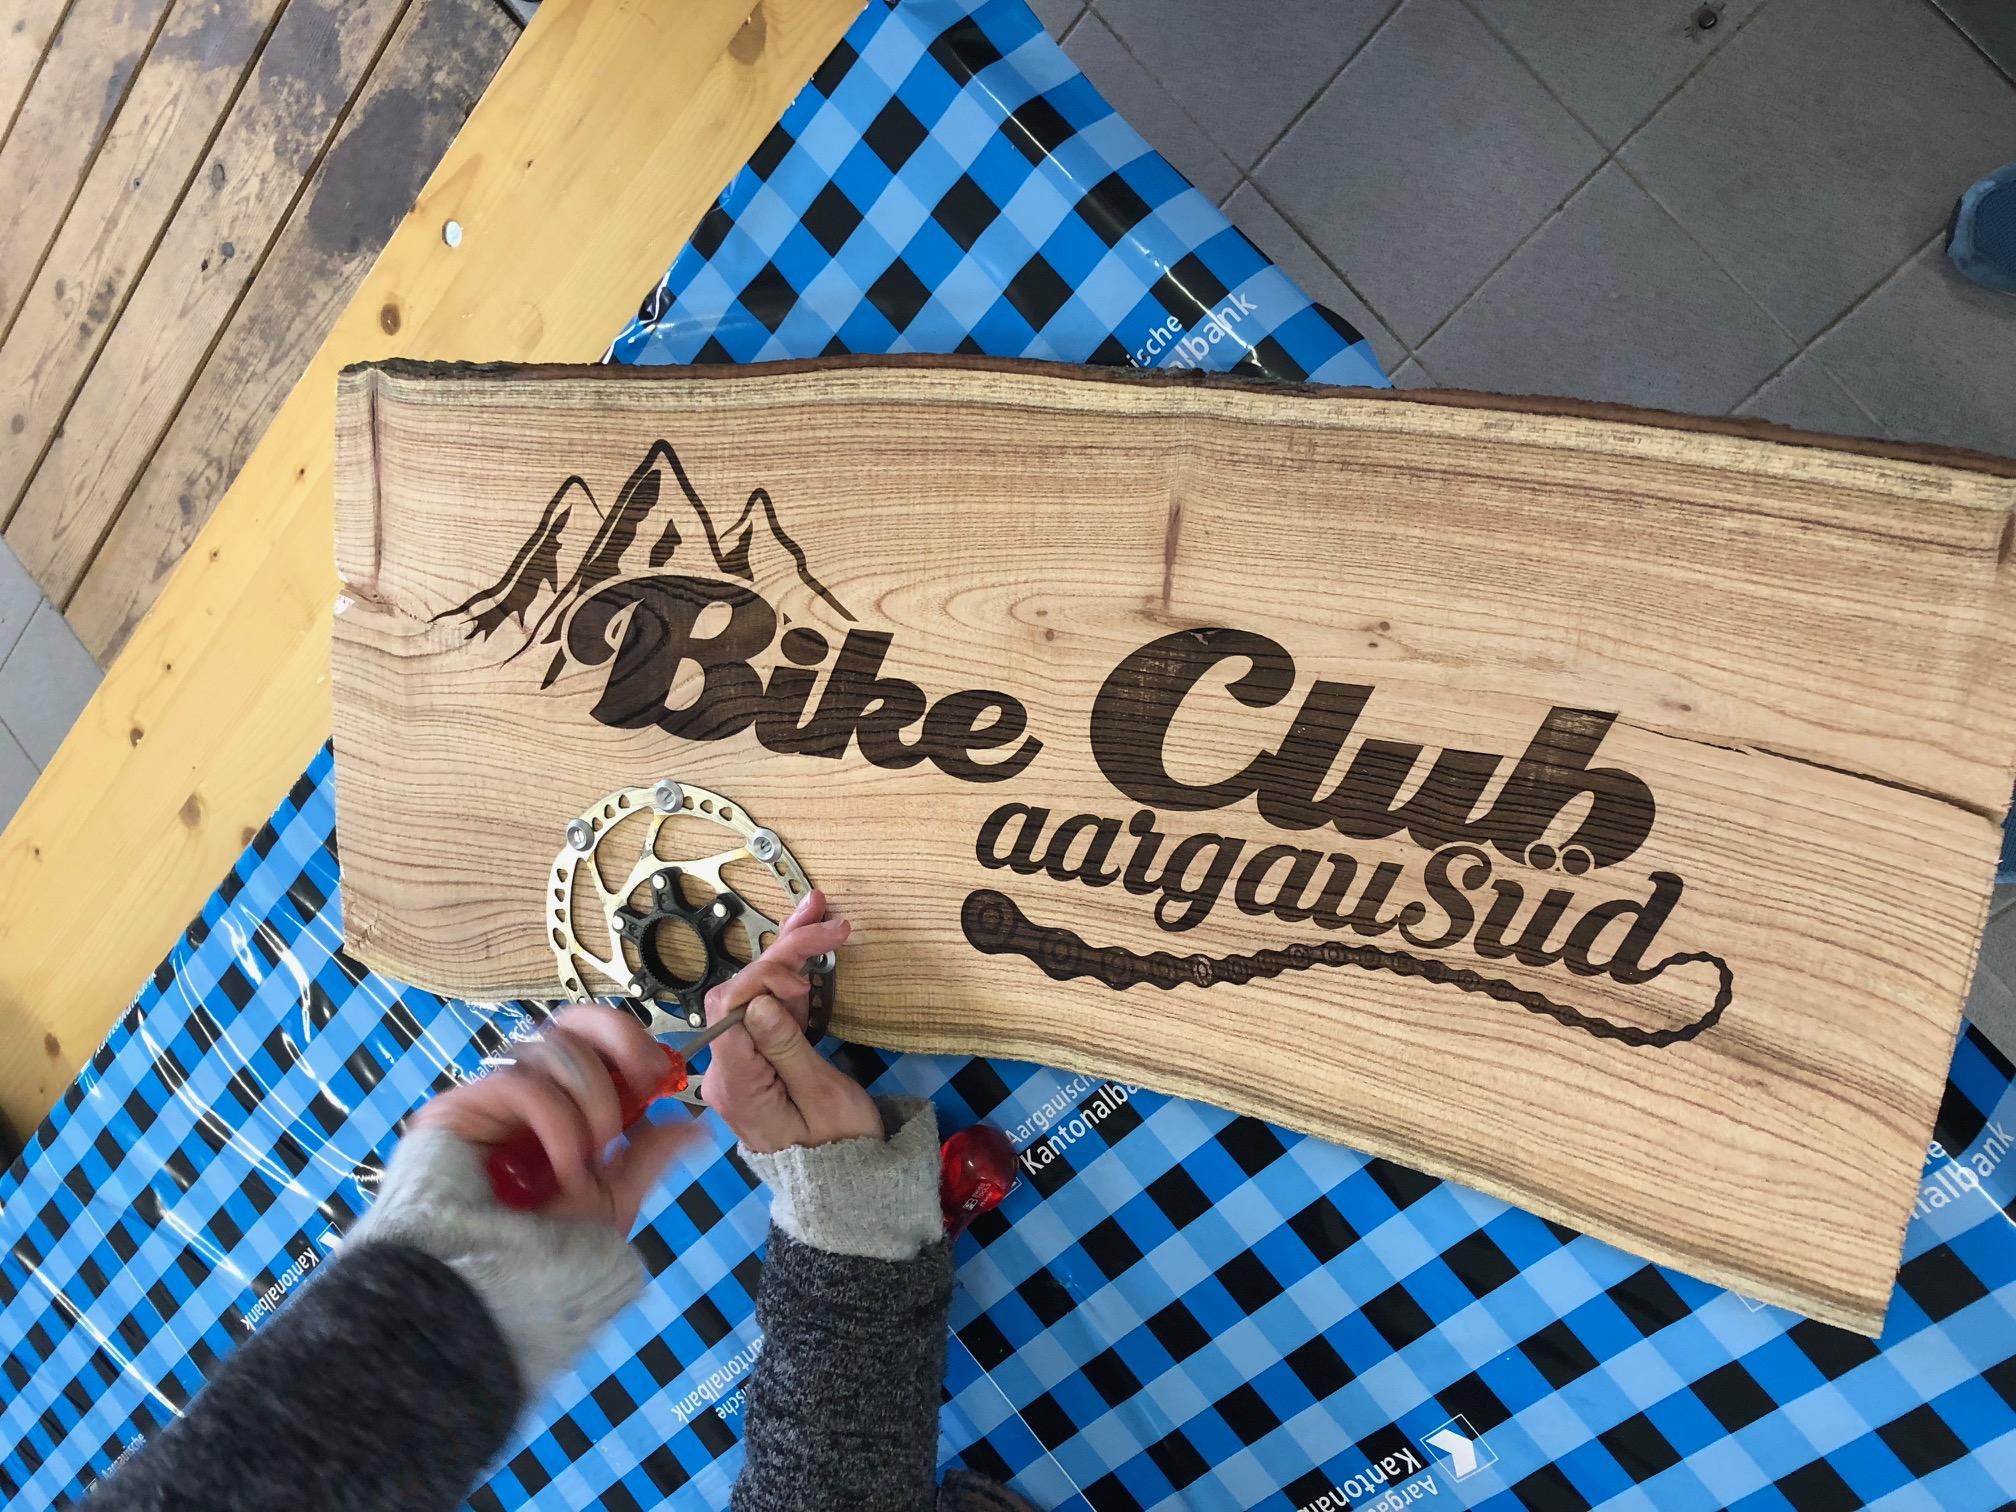 Bike Club aargauSüd Gründungsakt